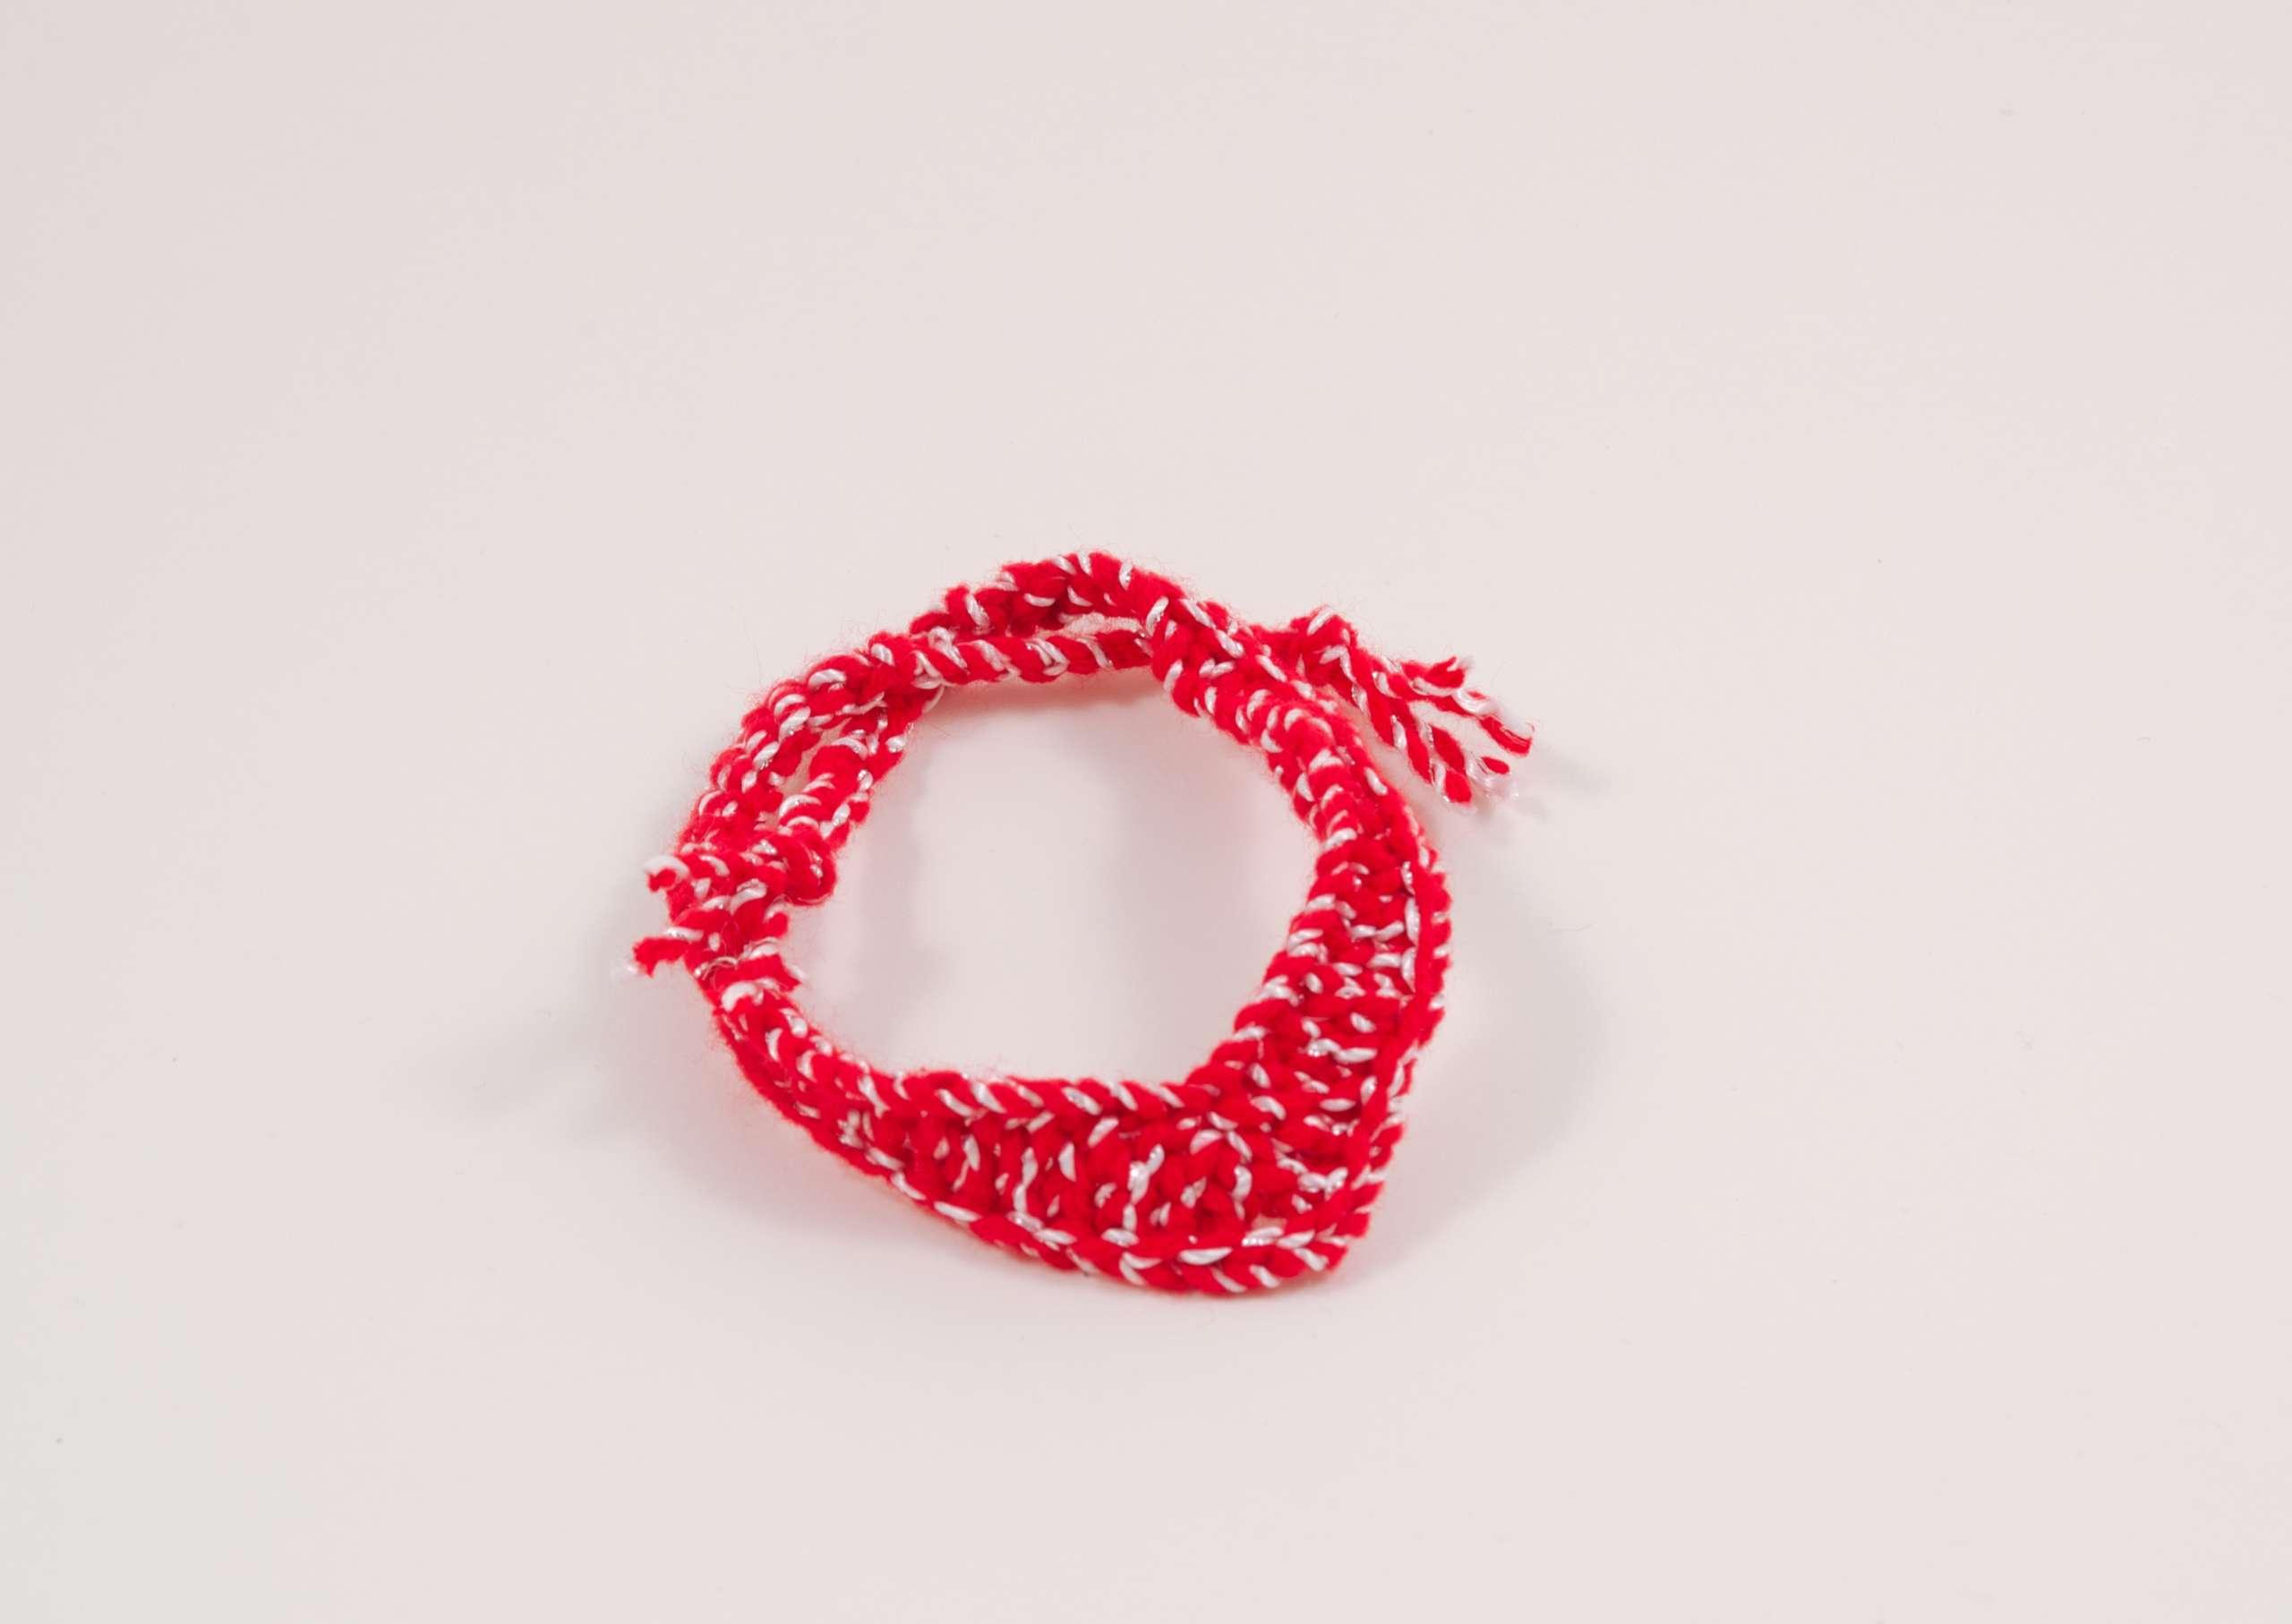 crochet red trinagle scarf